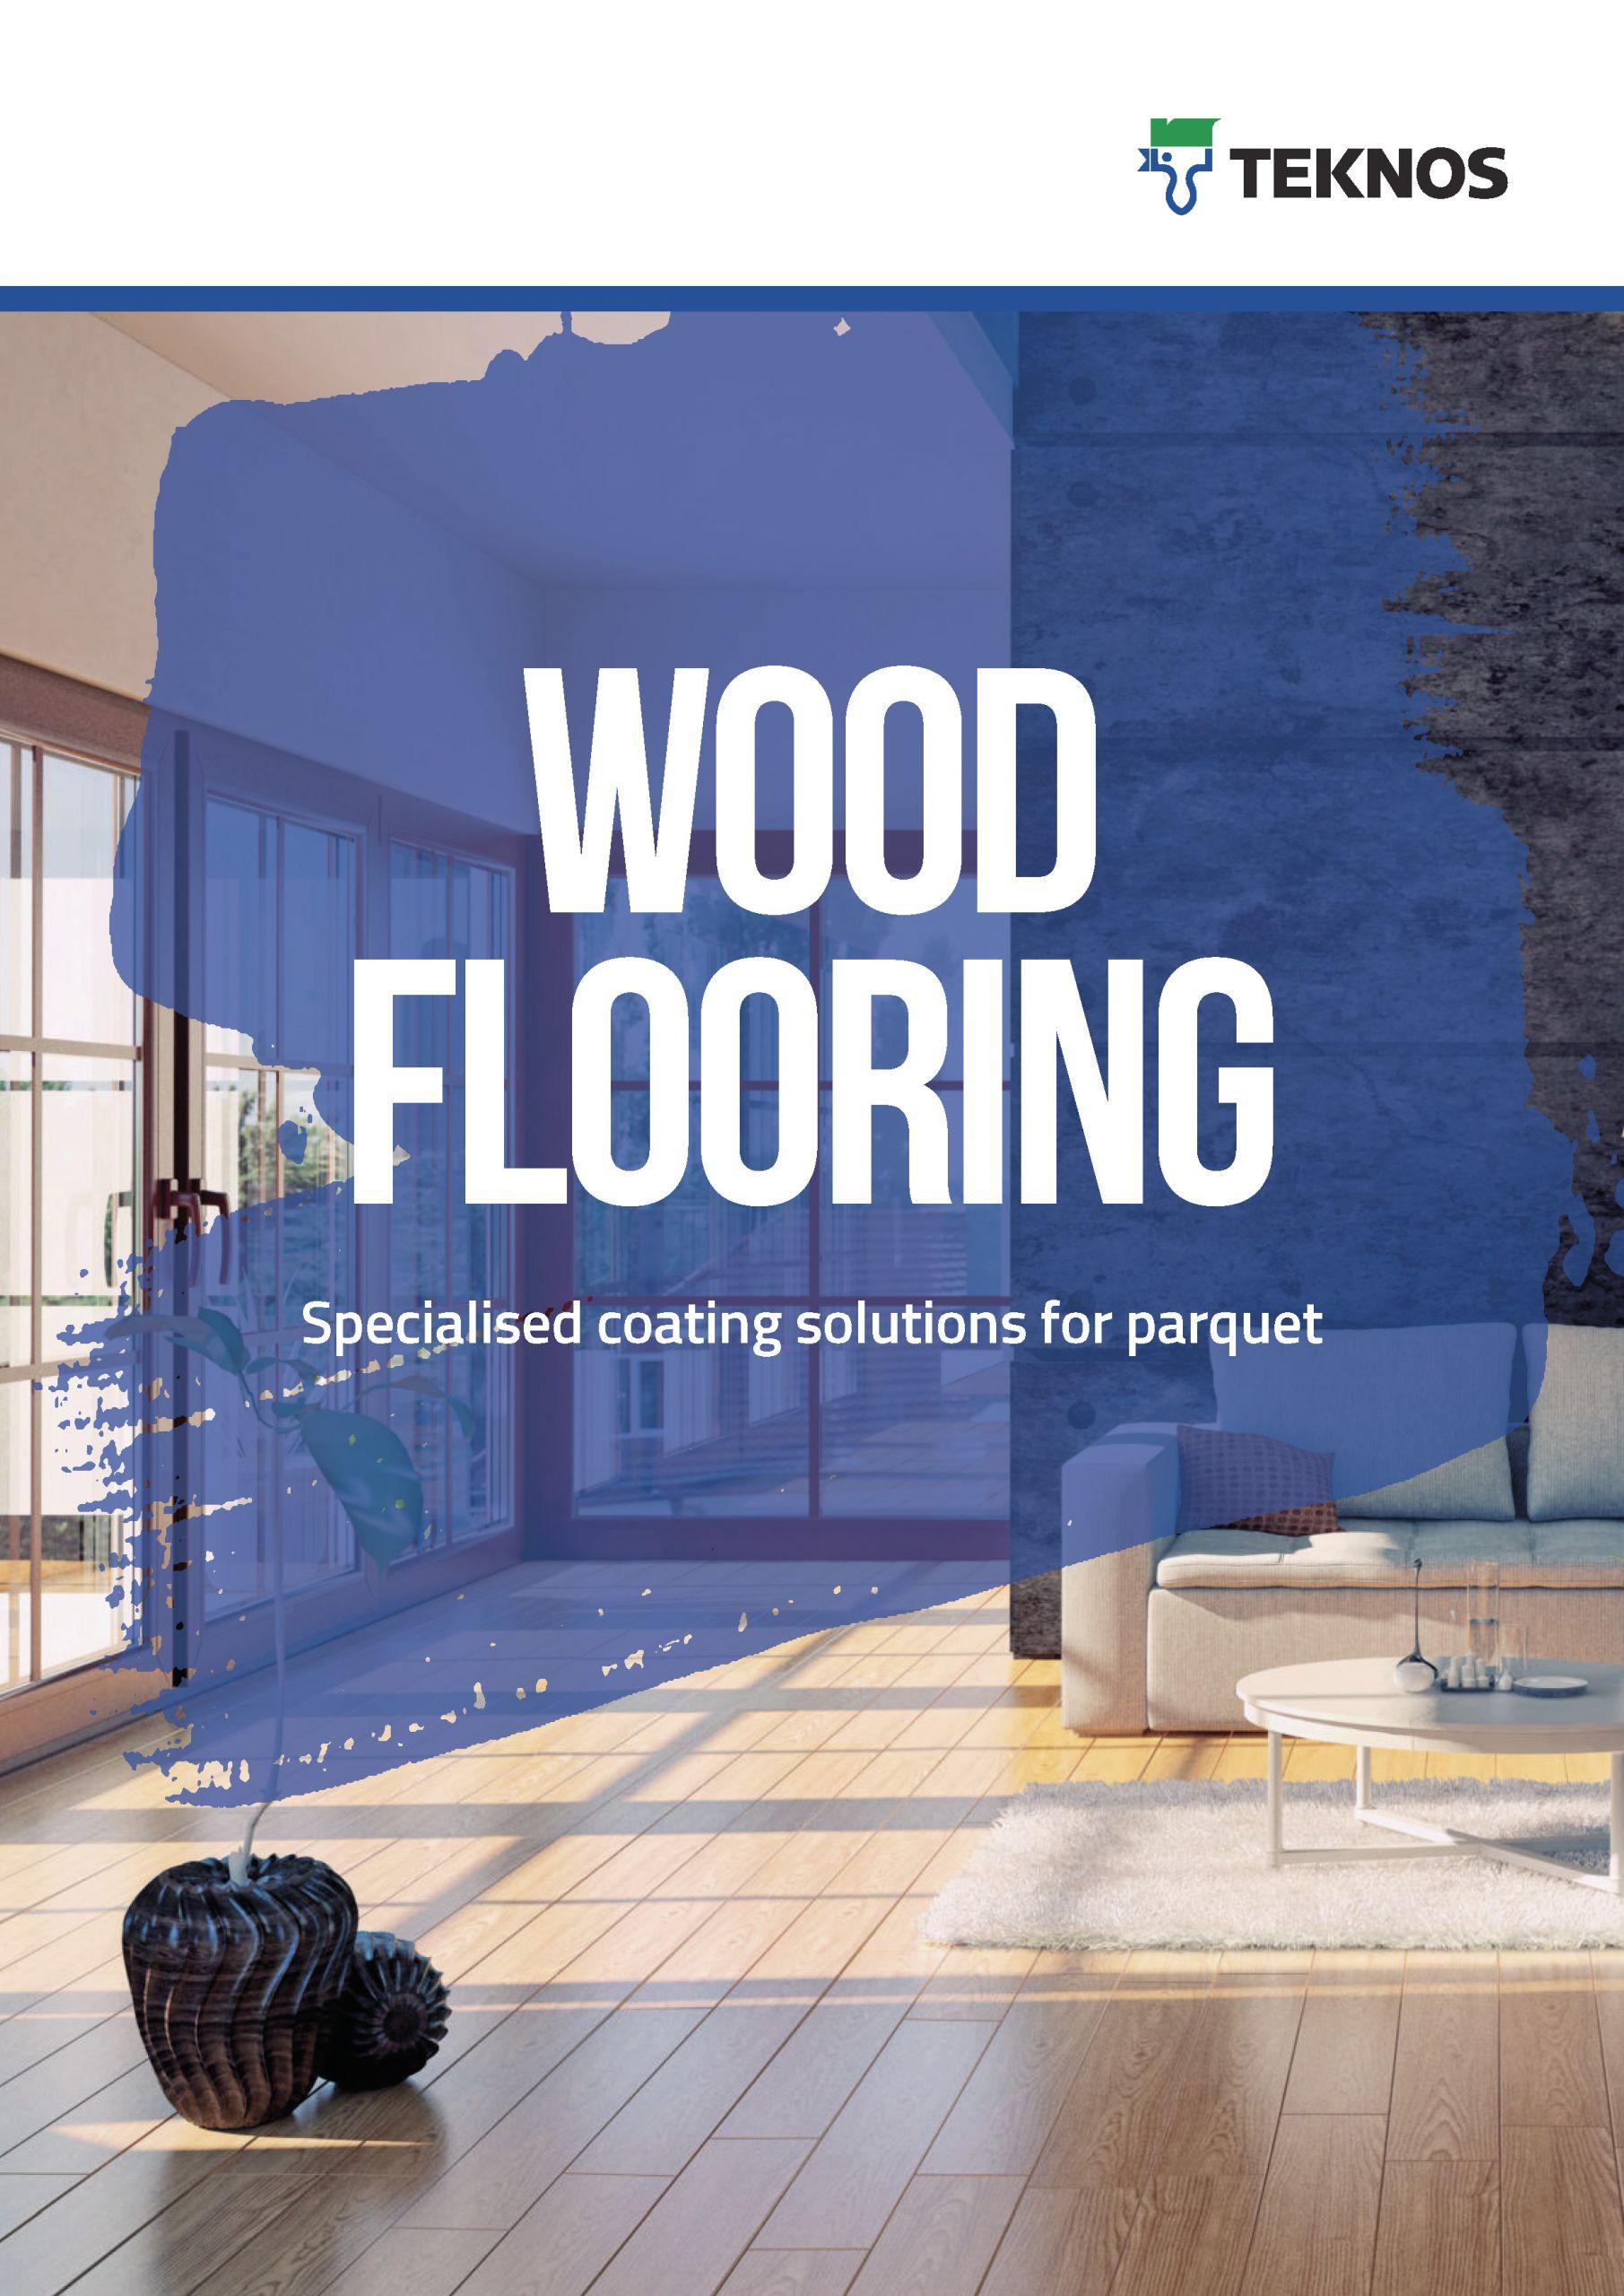 teknos wood flooring 2019 2481x3508